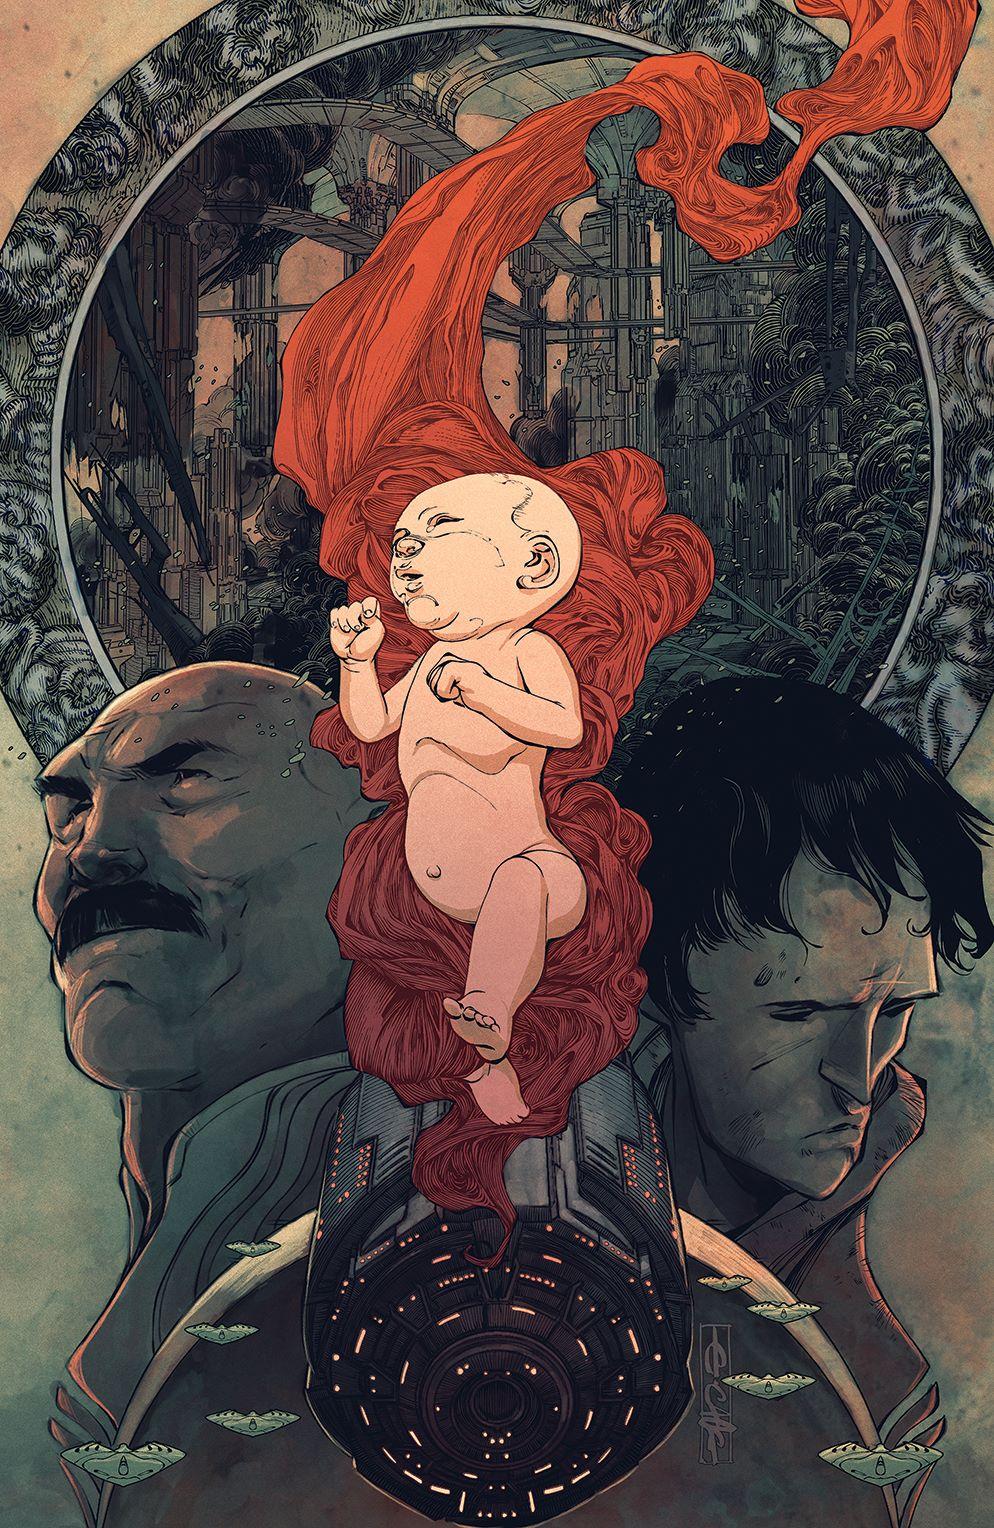 Dune_HouseAtreides_006_Cover_C_Variant ComicList Previews: DUNE HOUSE ATREIDES #6 (OF 12)